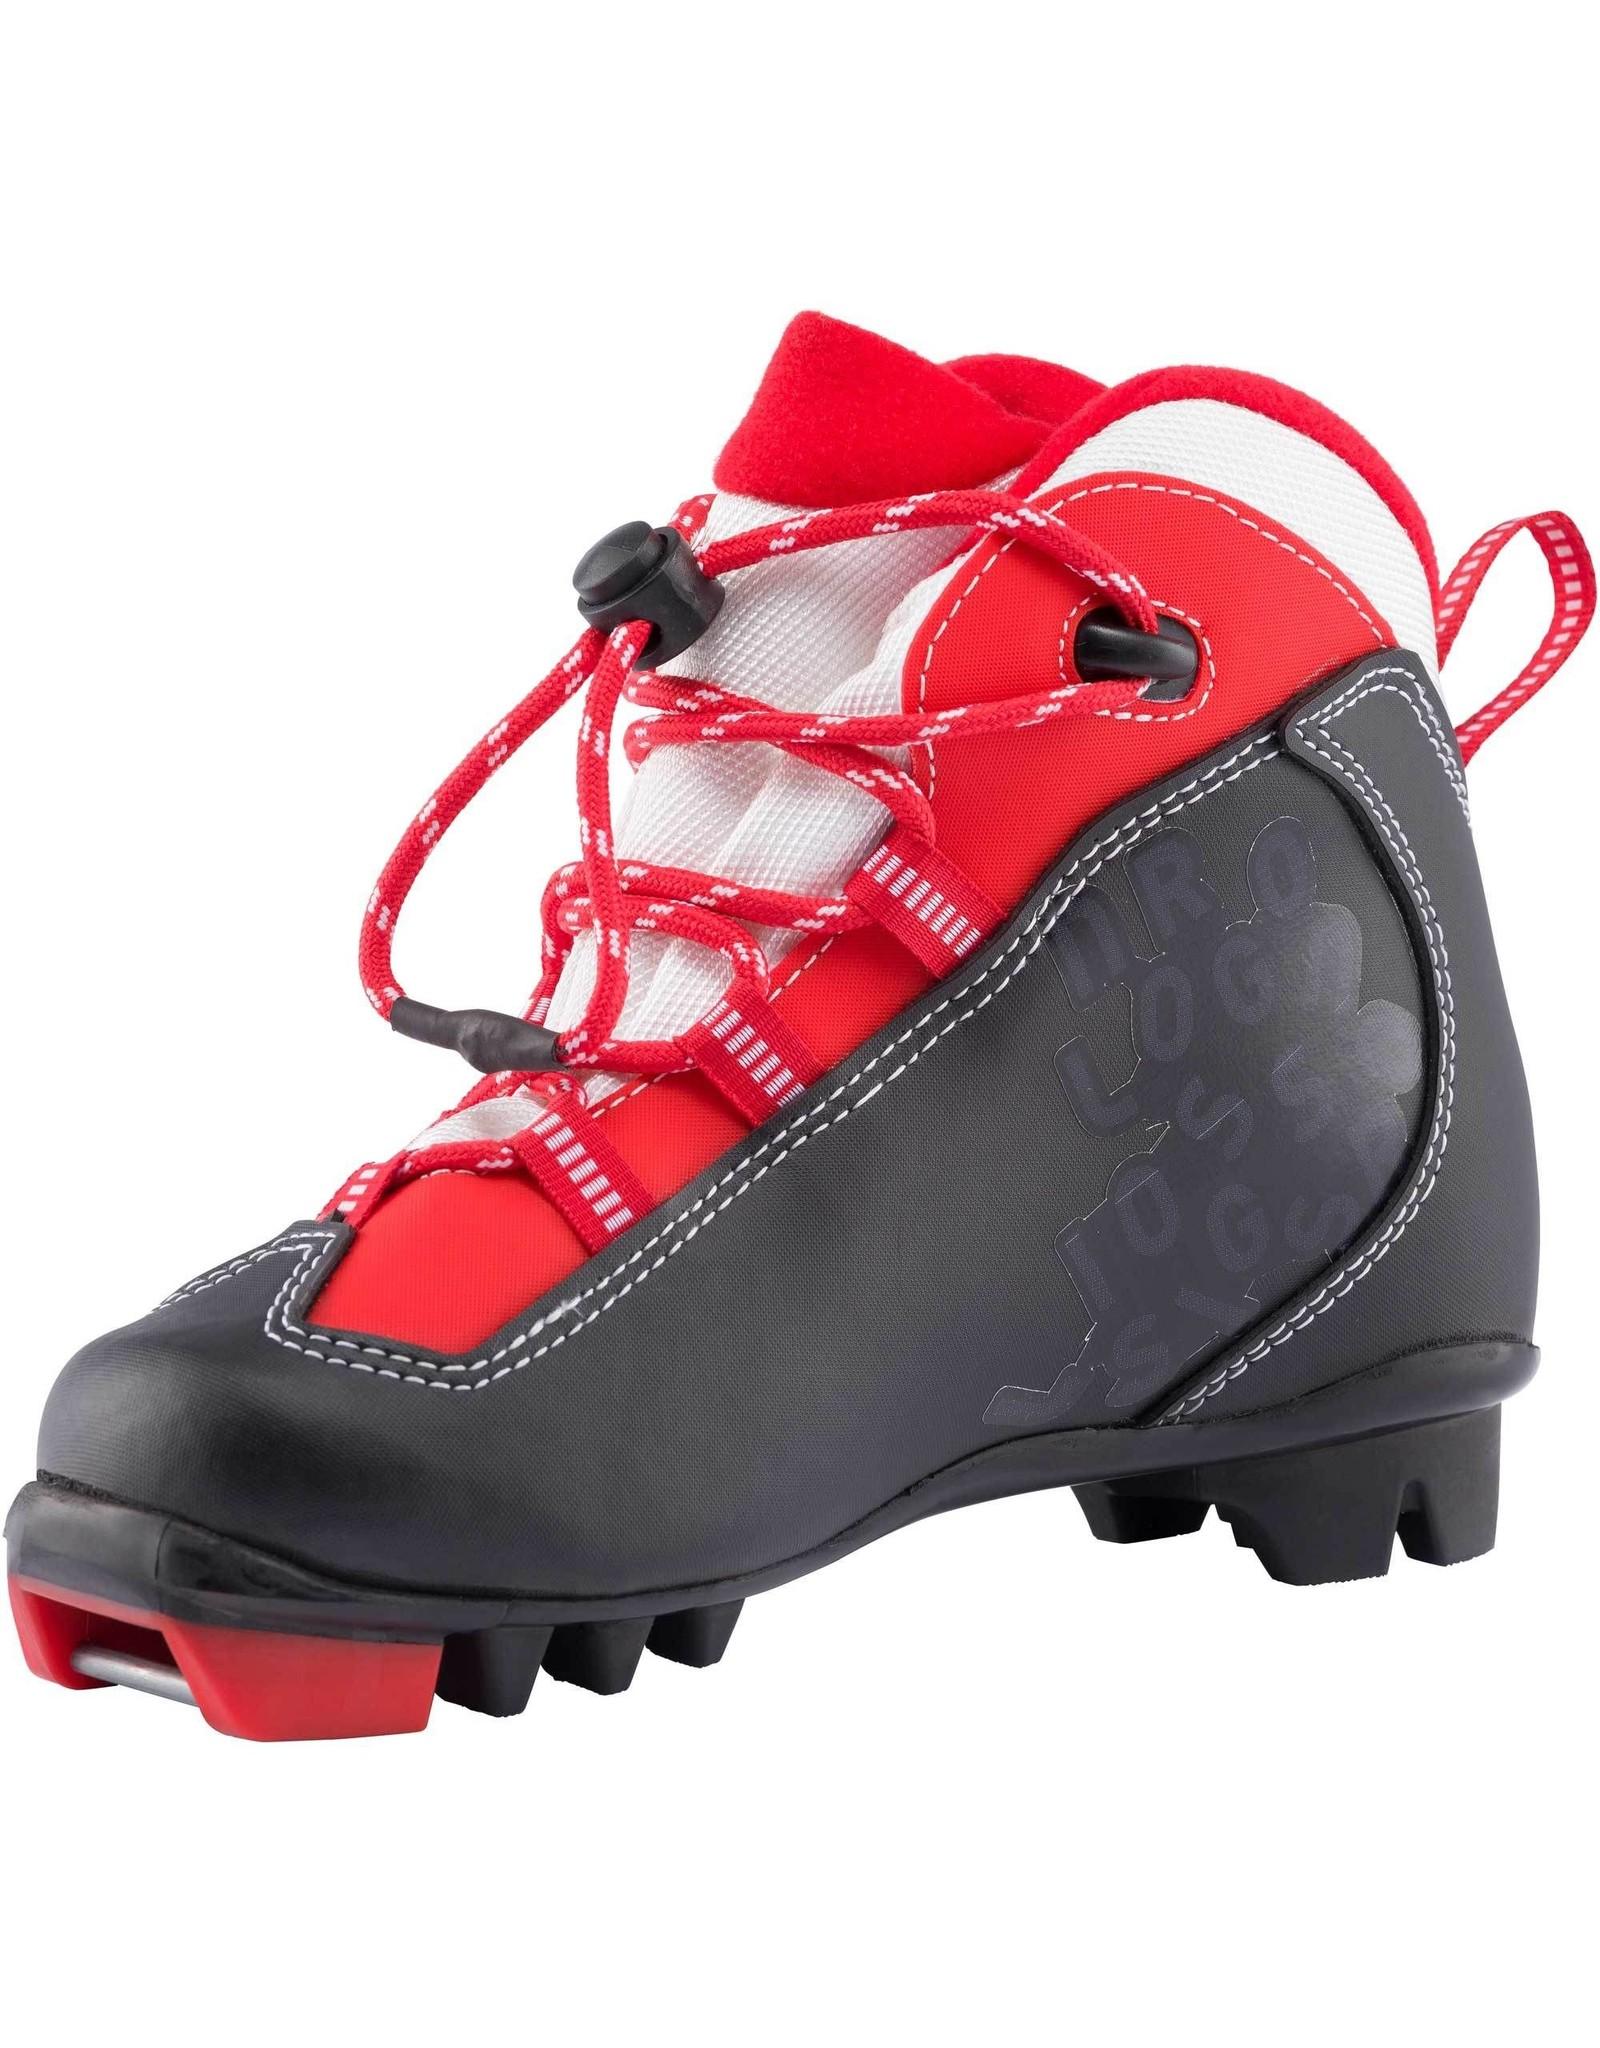 ROSSIGNOL ROSSIGNOL- X-1 JR cross-country ski boots